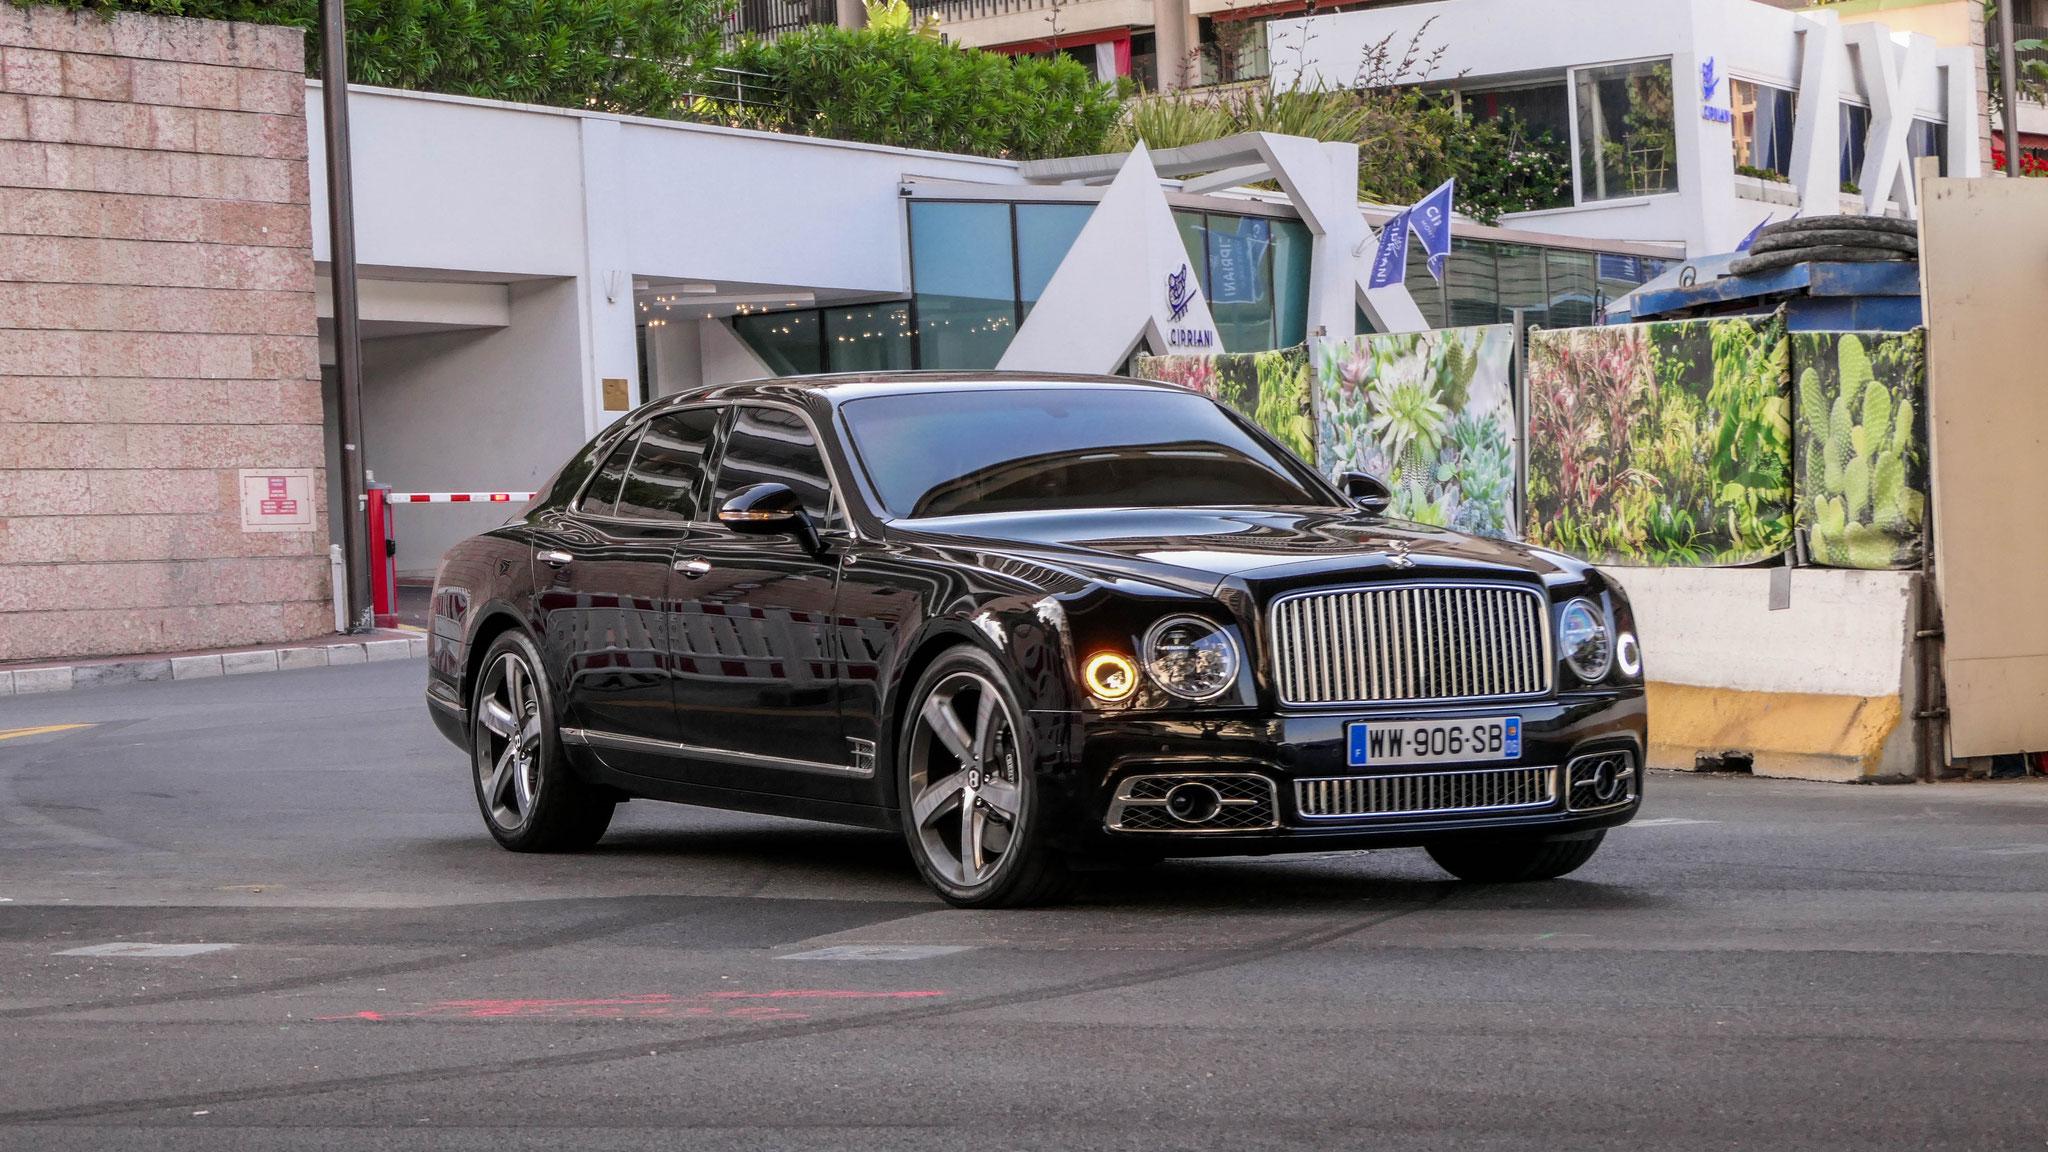 Bentley Mulsanne - WW-906-SB-06 (FRA)